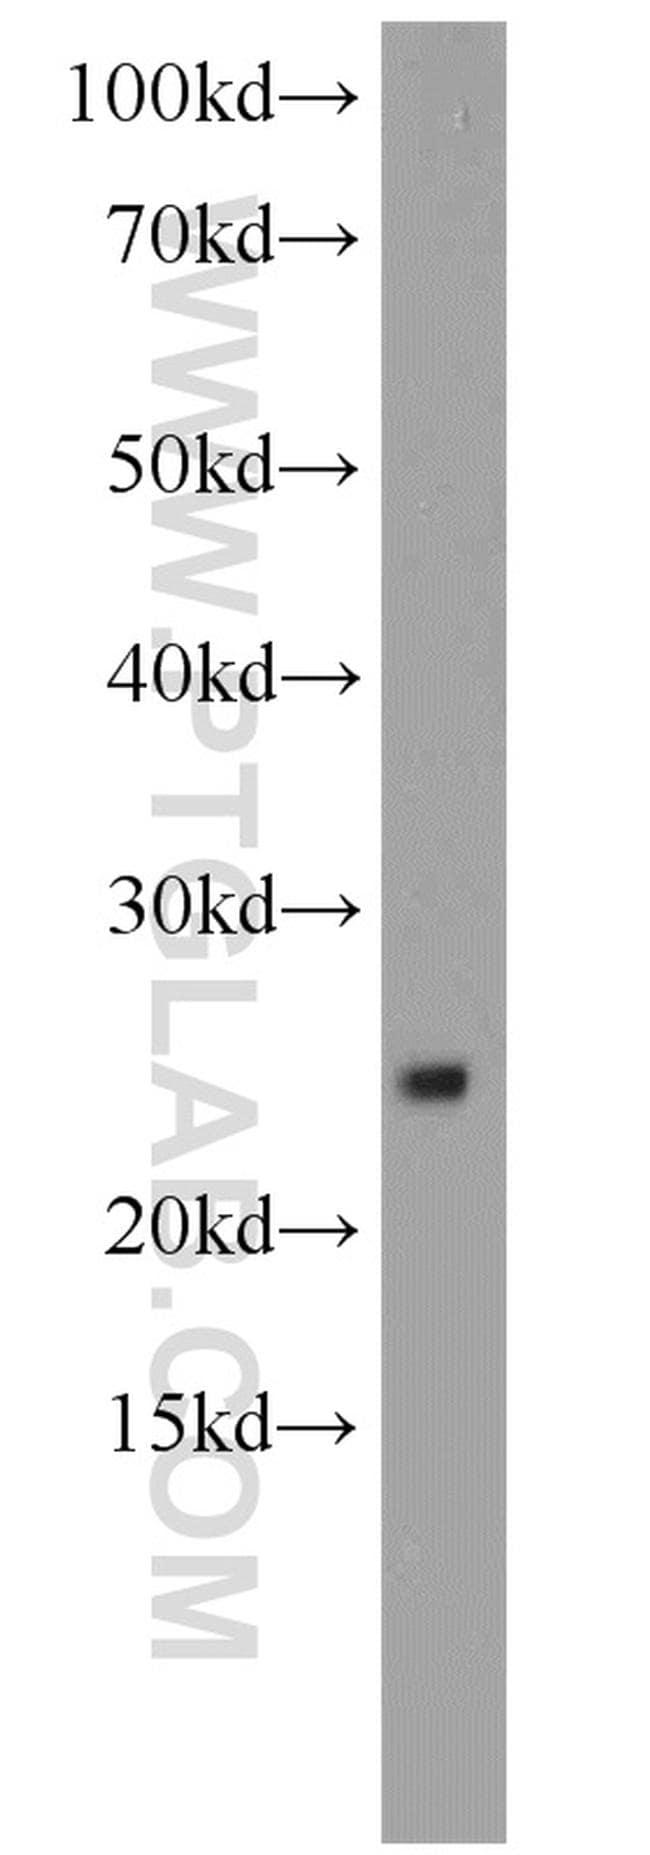 RPS9 Antibody in Western Blot (WB)